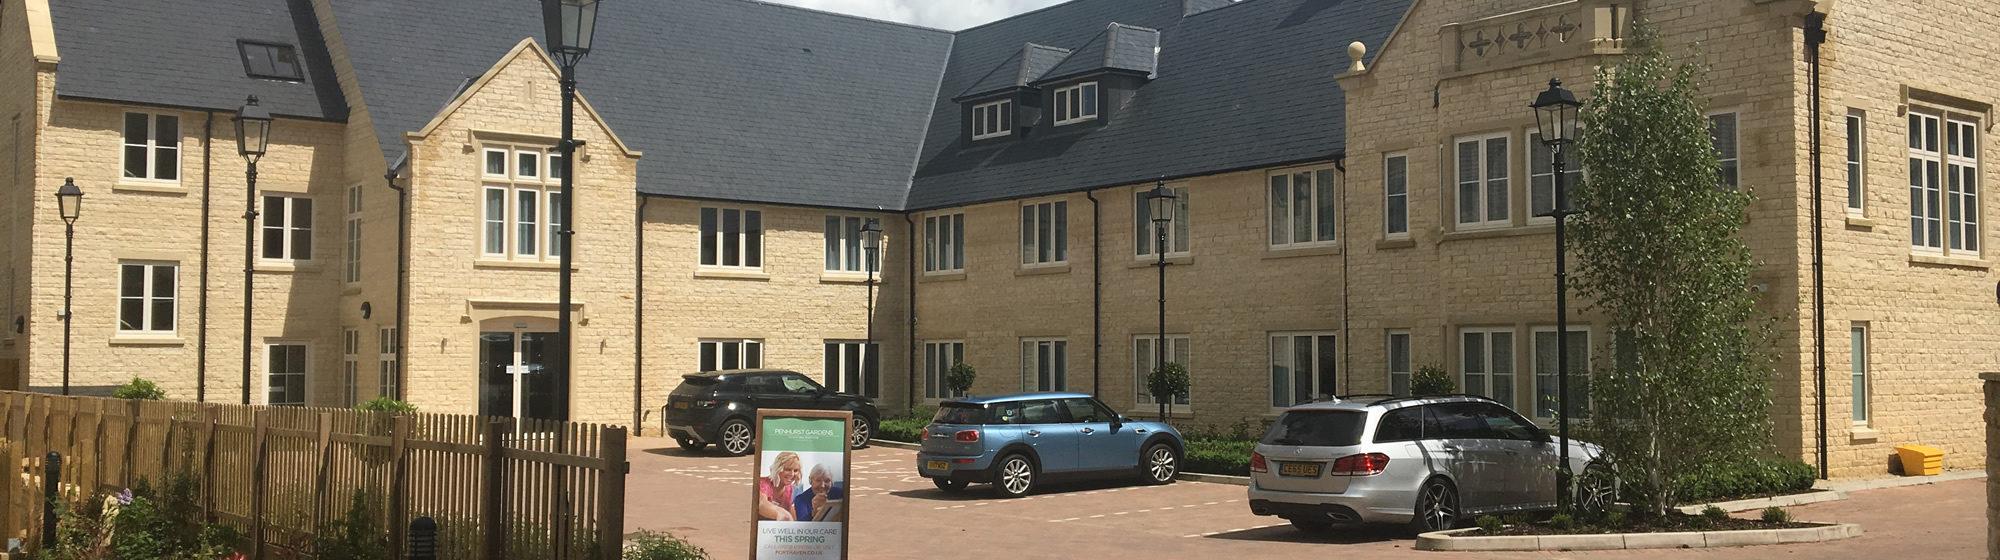 banner-residential-care